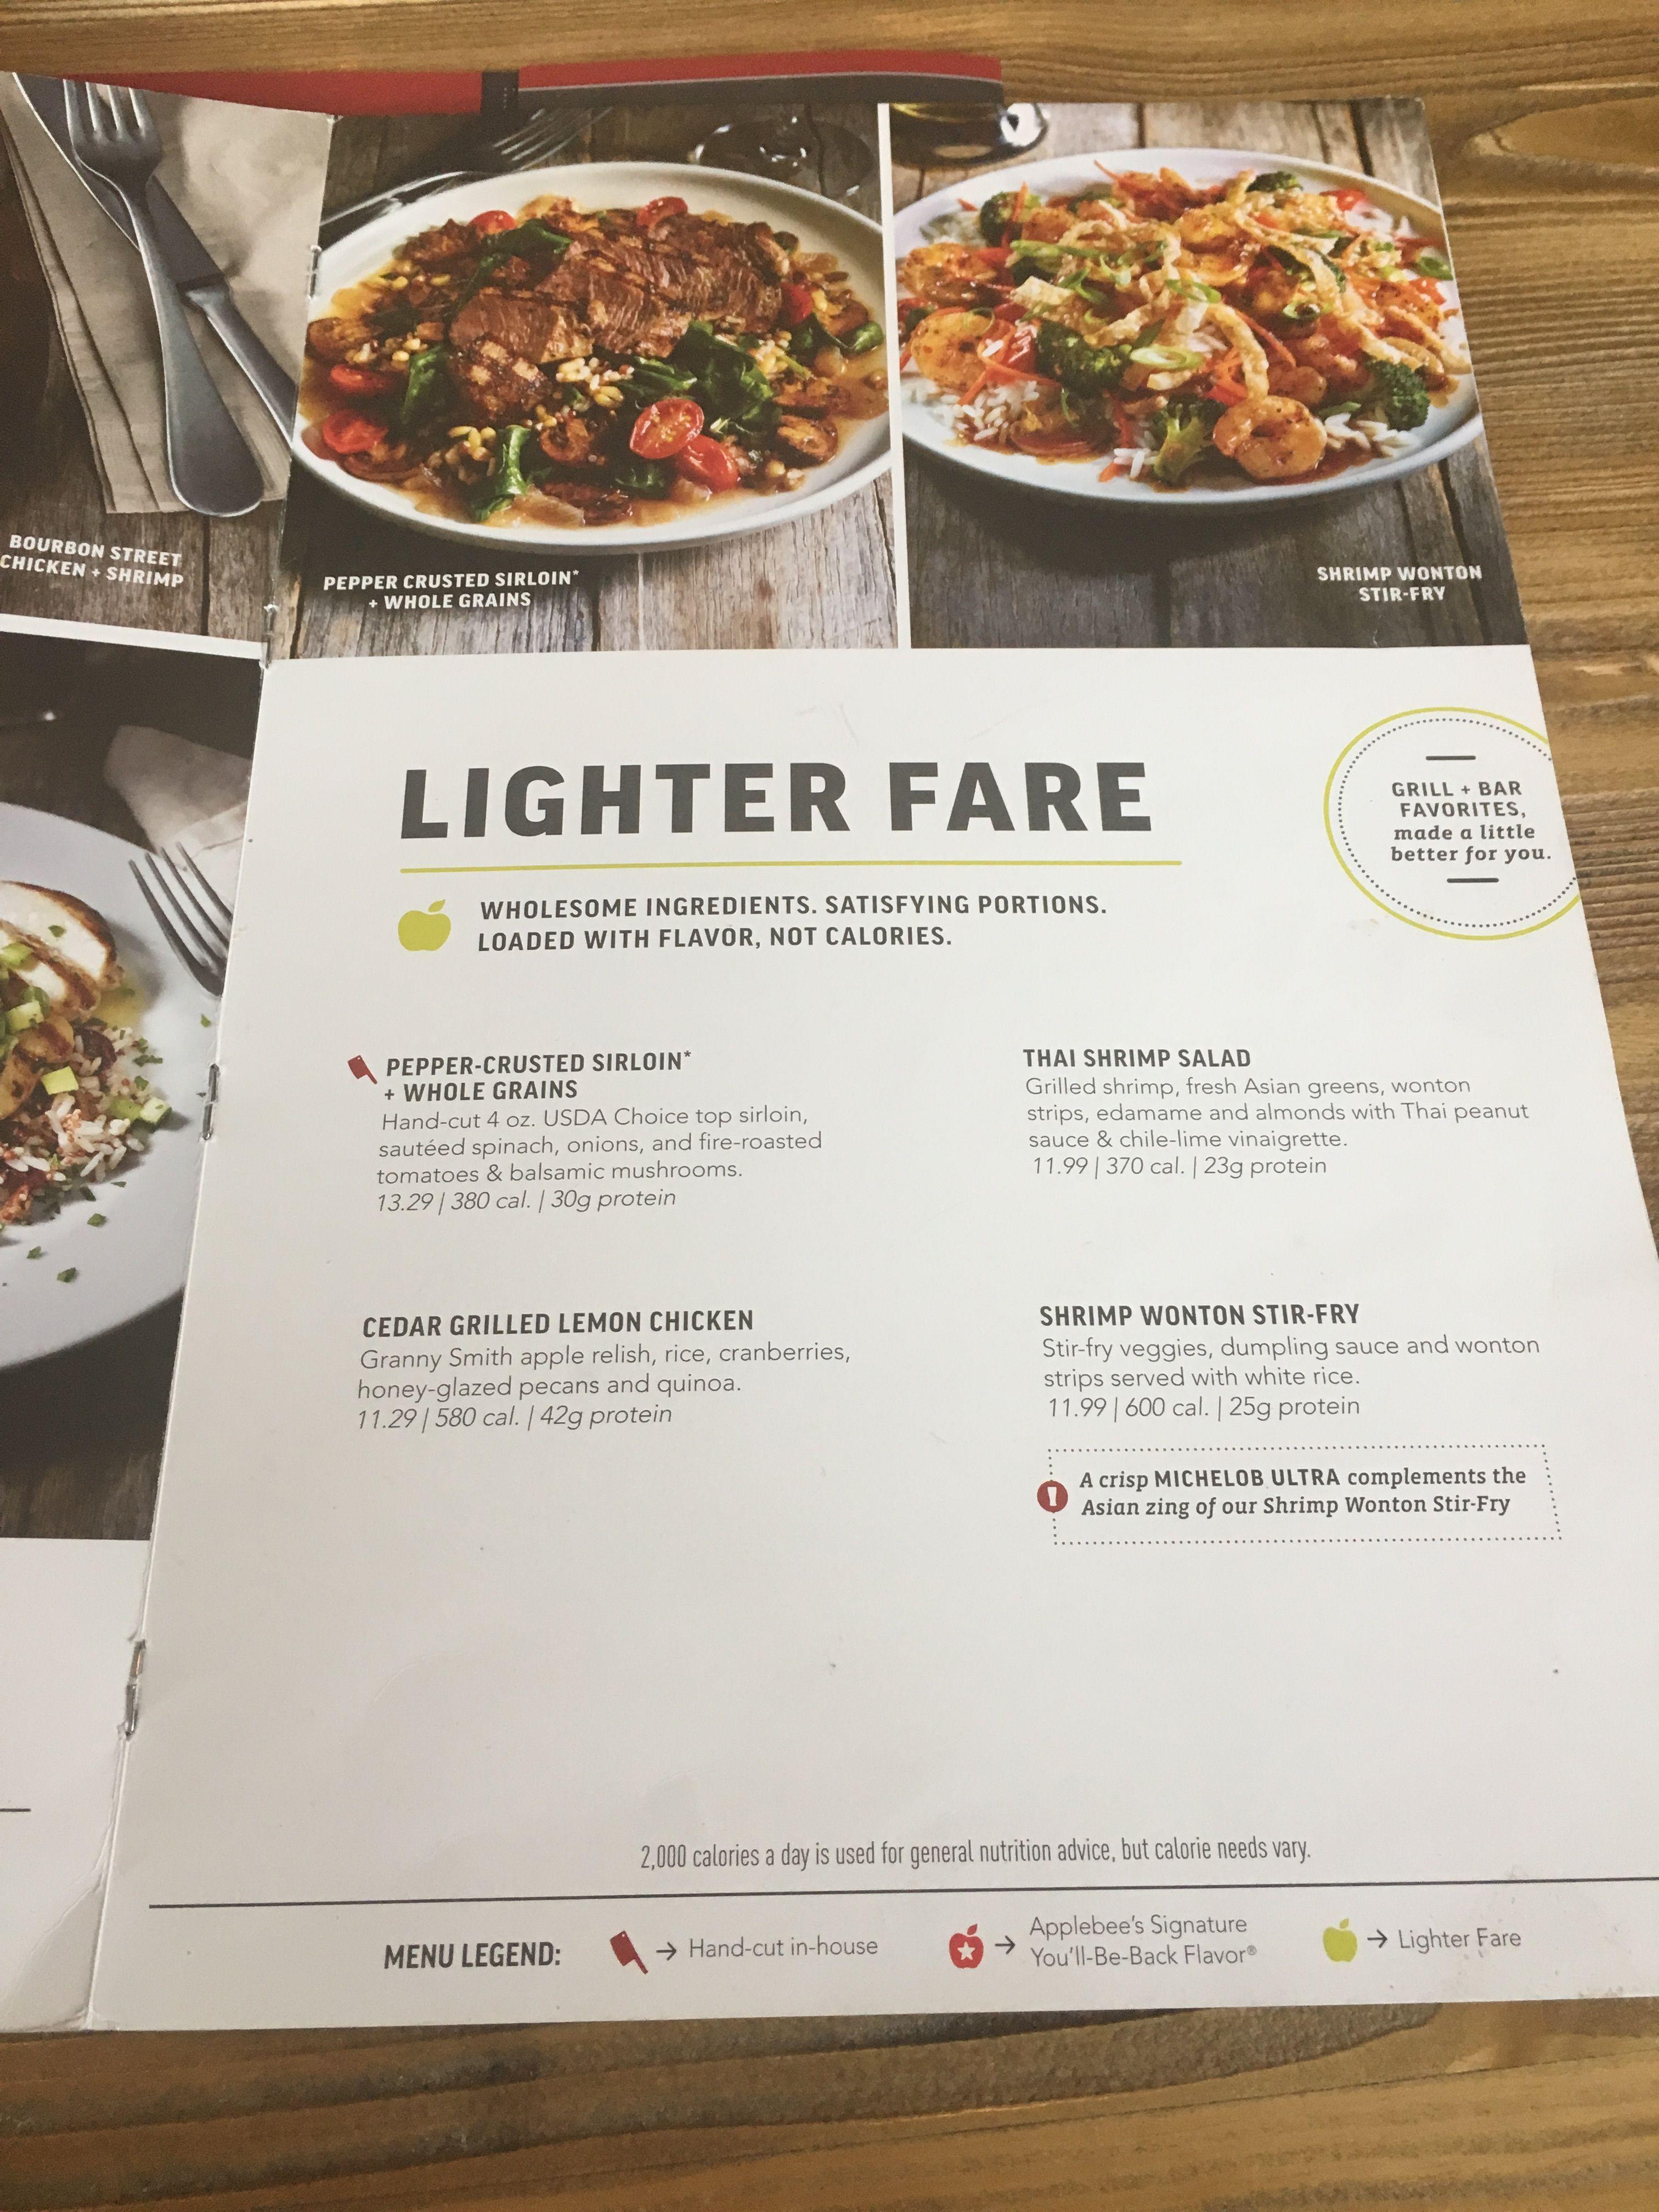 applebee's, may 2017 - washington, dc | menu labeling | pinterest